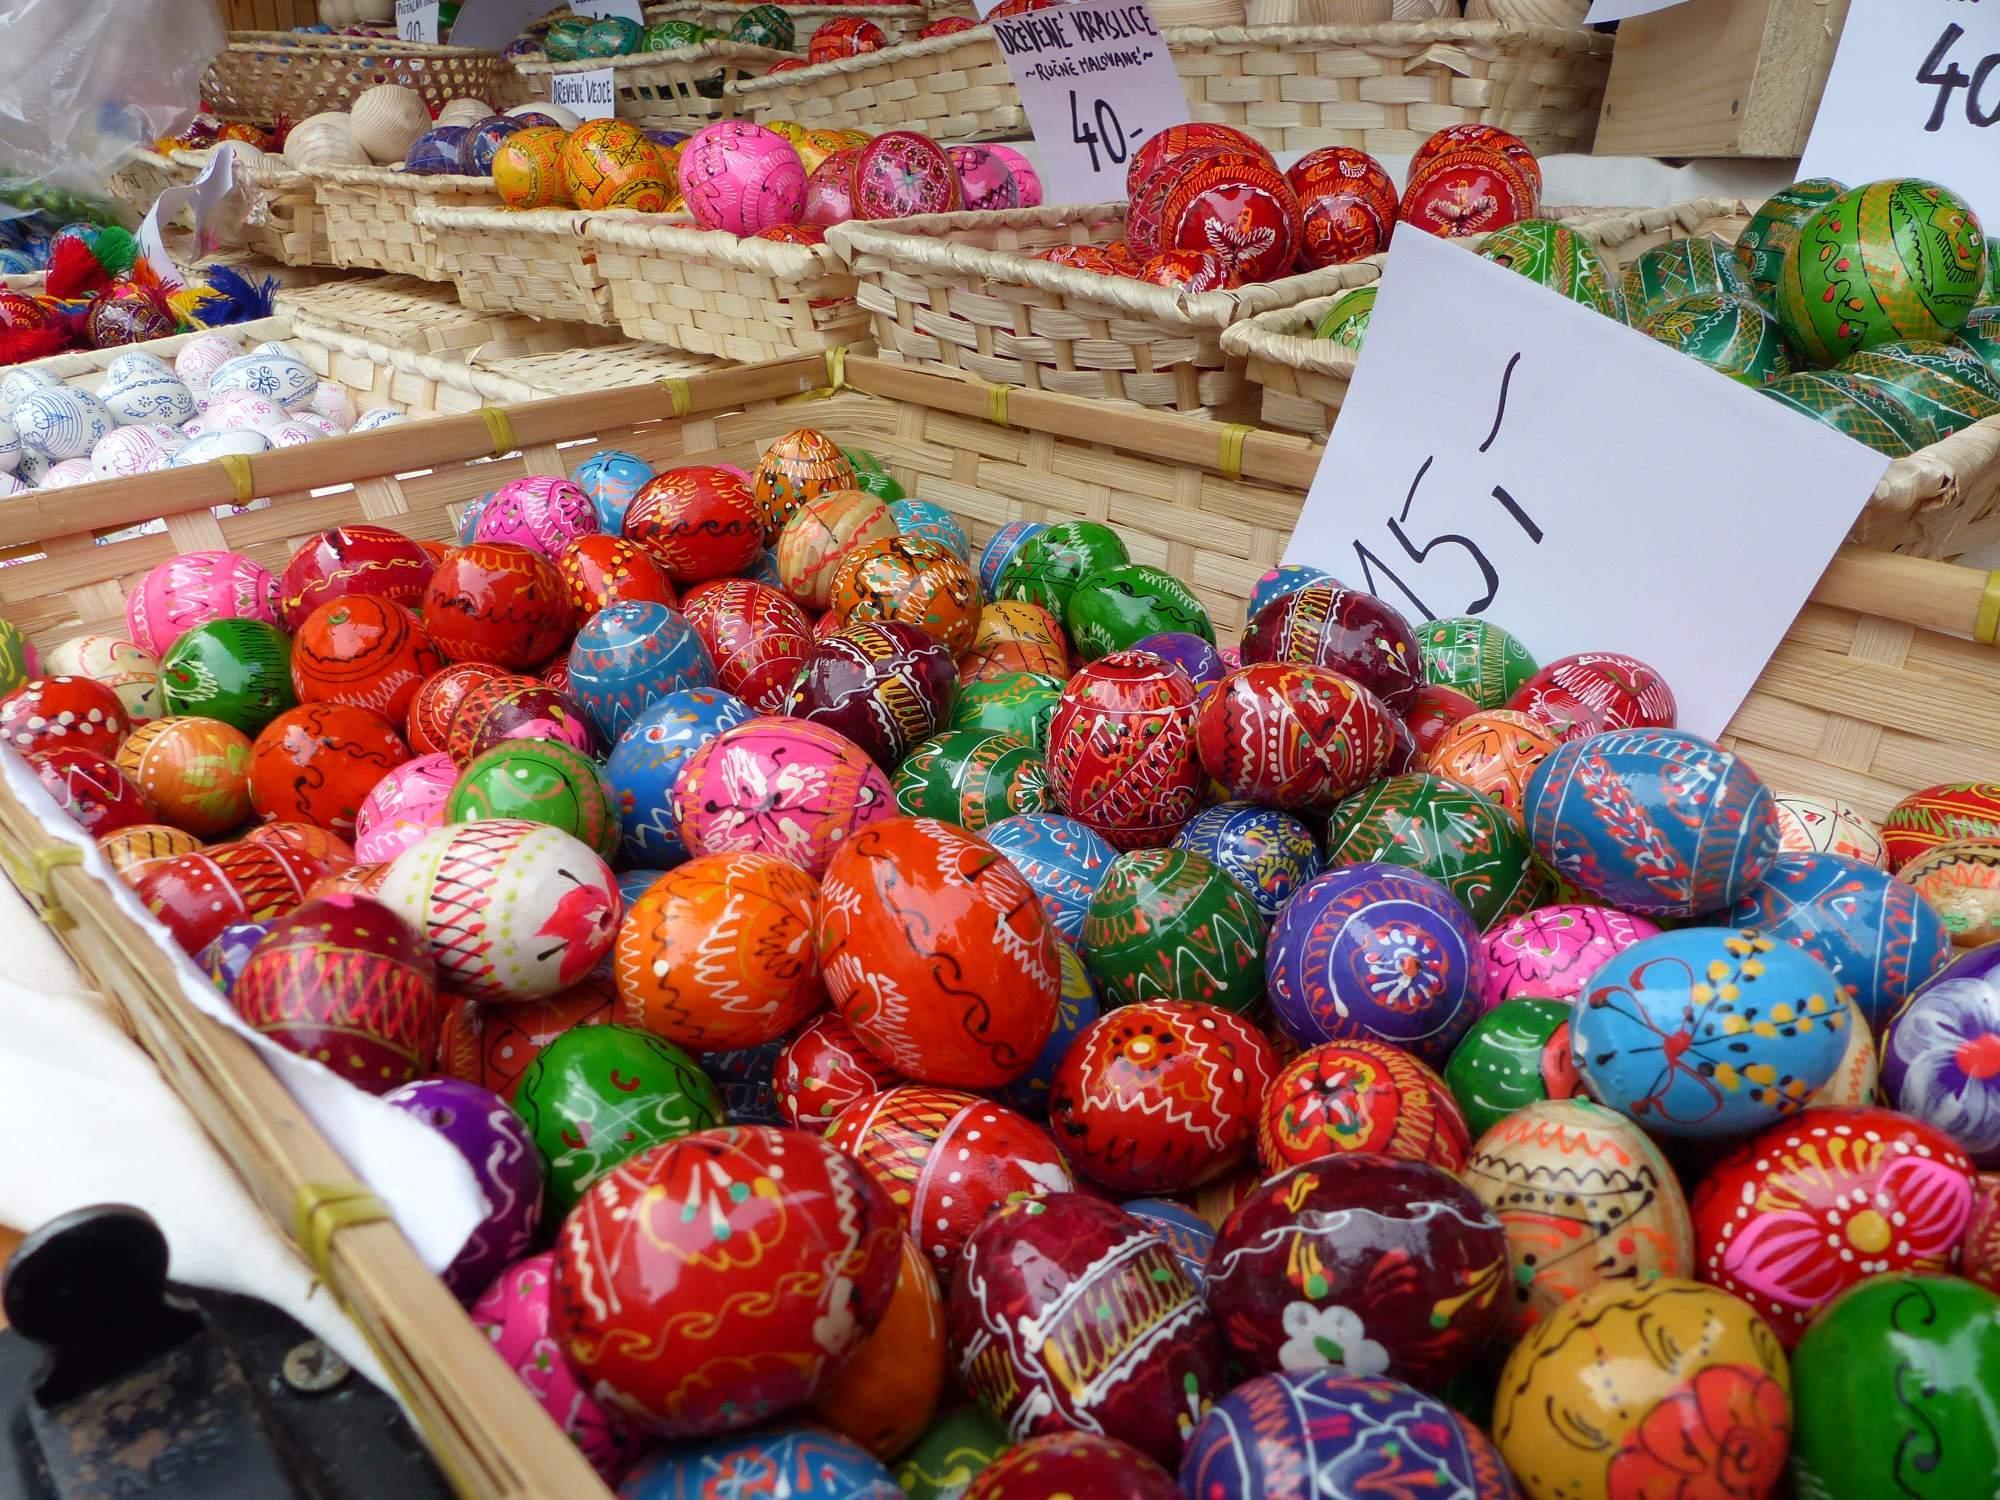 Barevné velikonoční kraslice. Foto: Stanislav Šindelka